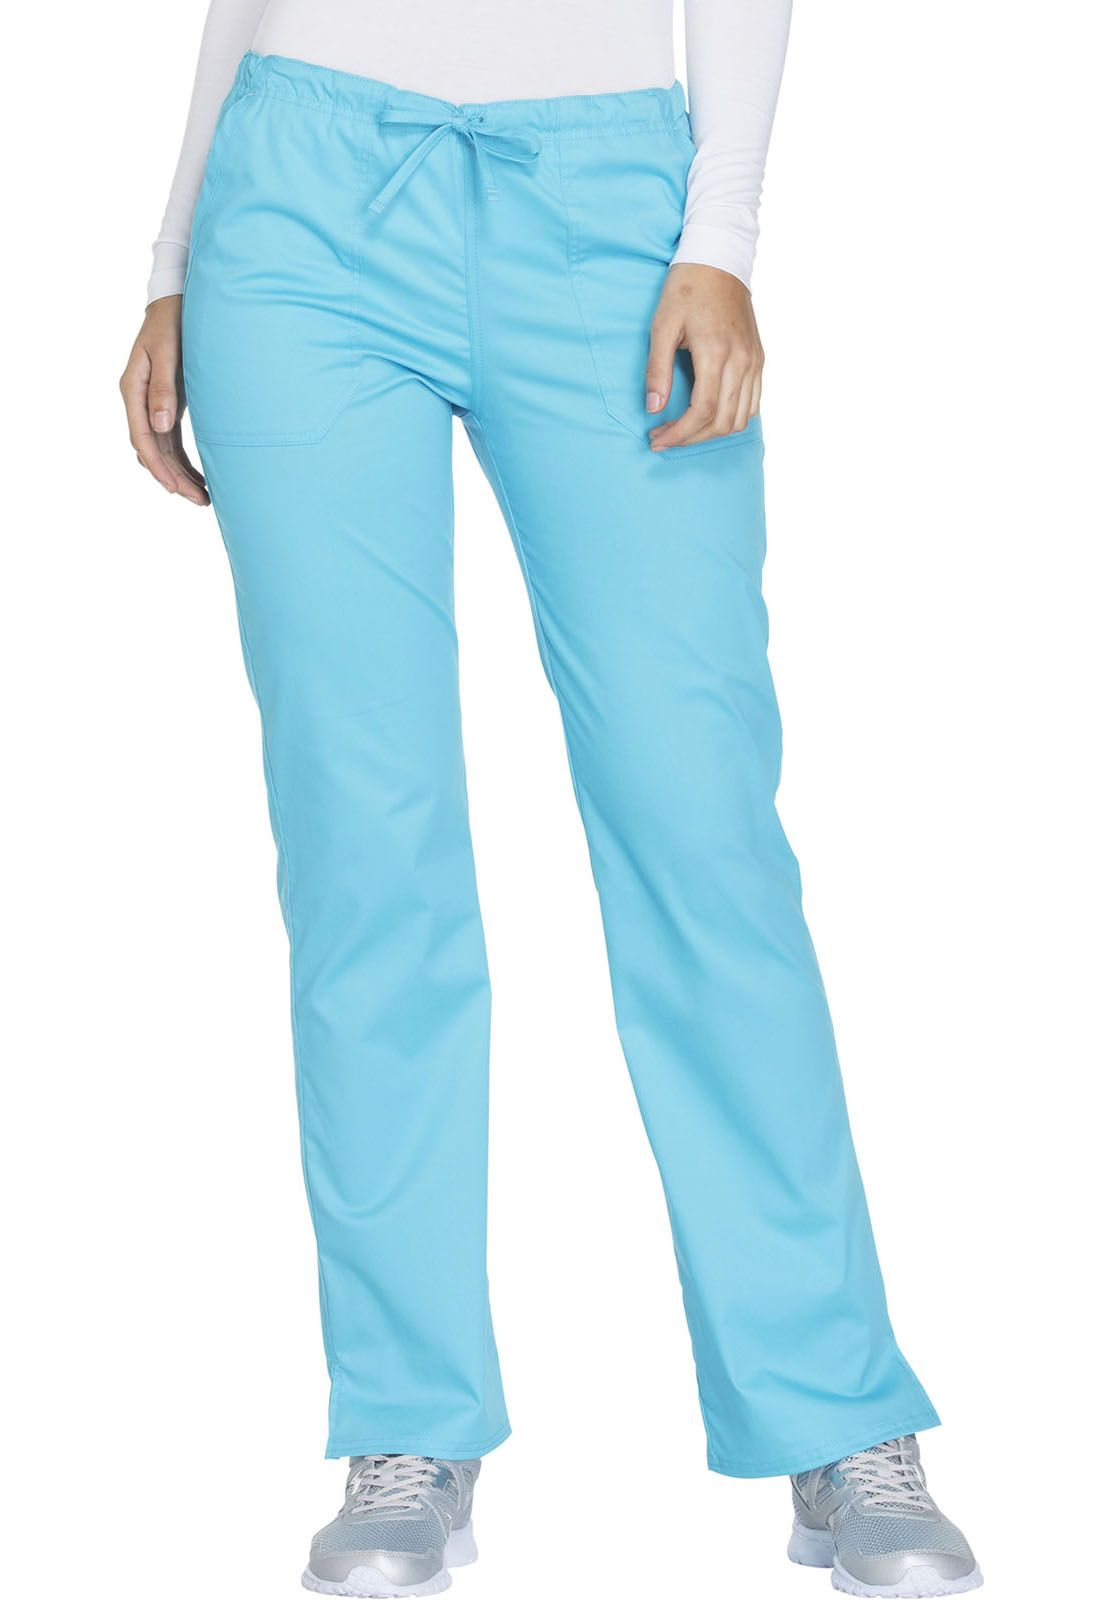 Pantalon Uniforme Medico Mujer Unicolor Cherokee Ww130 Trqw Health Company Ropa De Trabajo Femenina Pantalon Con Lazo Uniformes Medicos